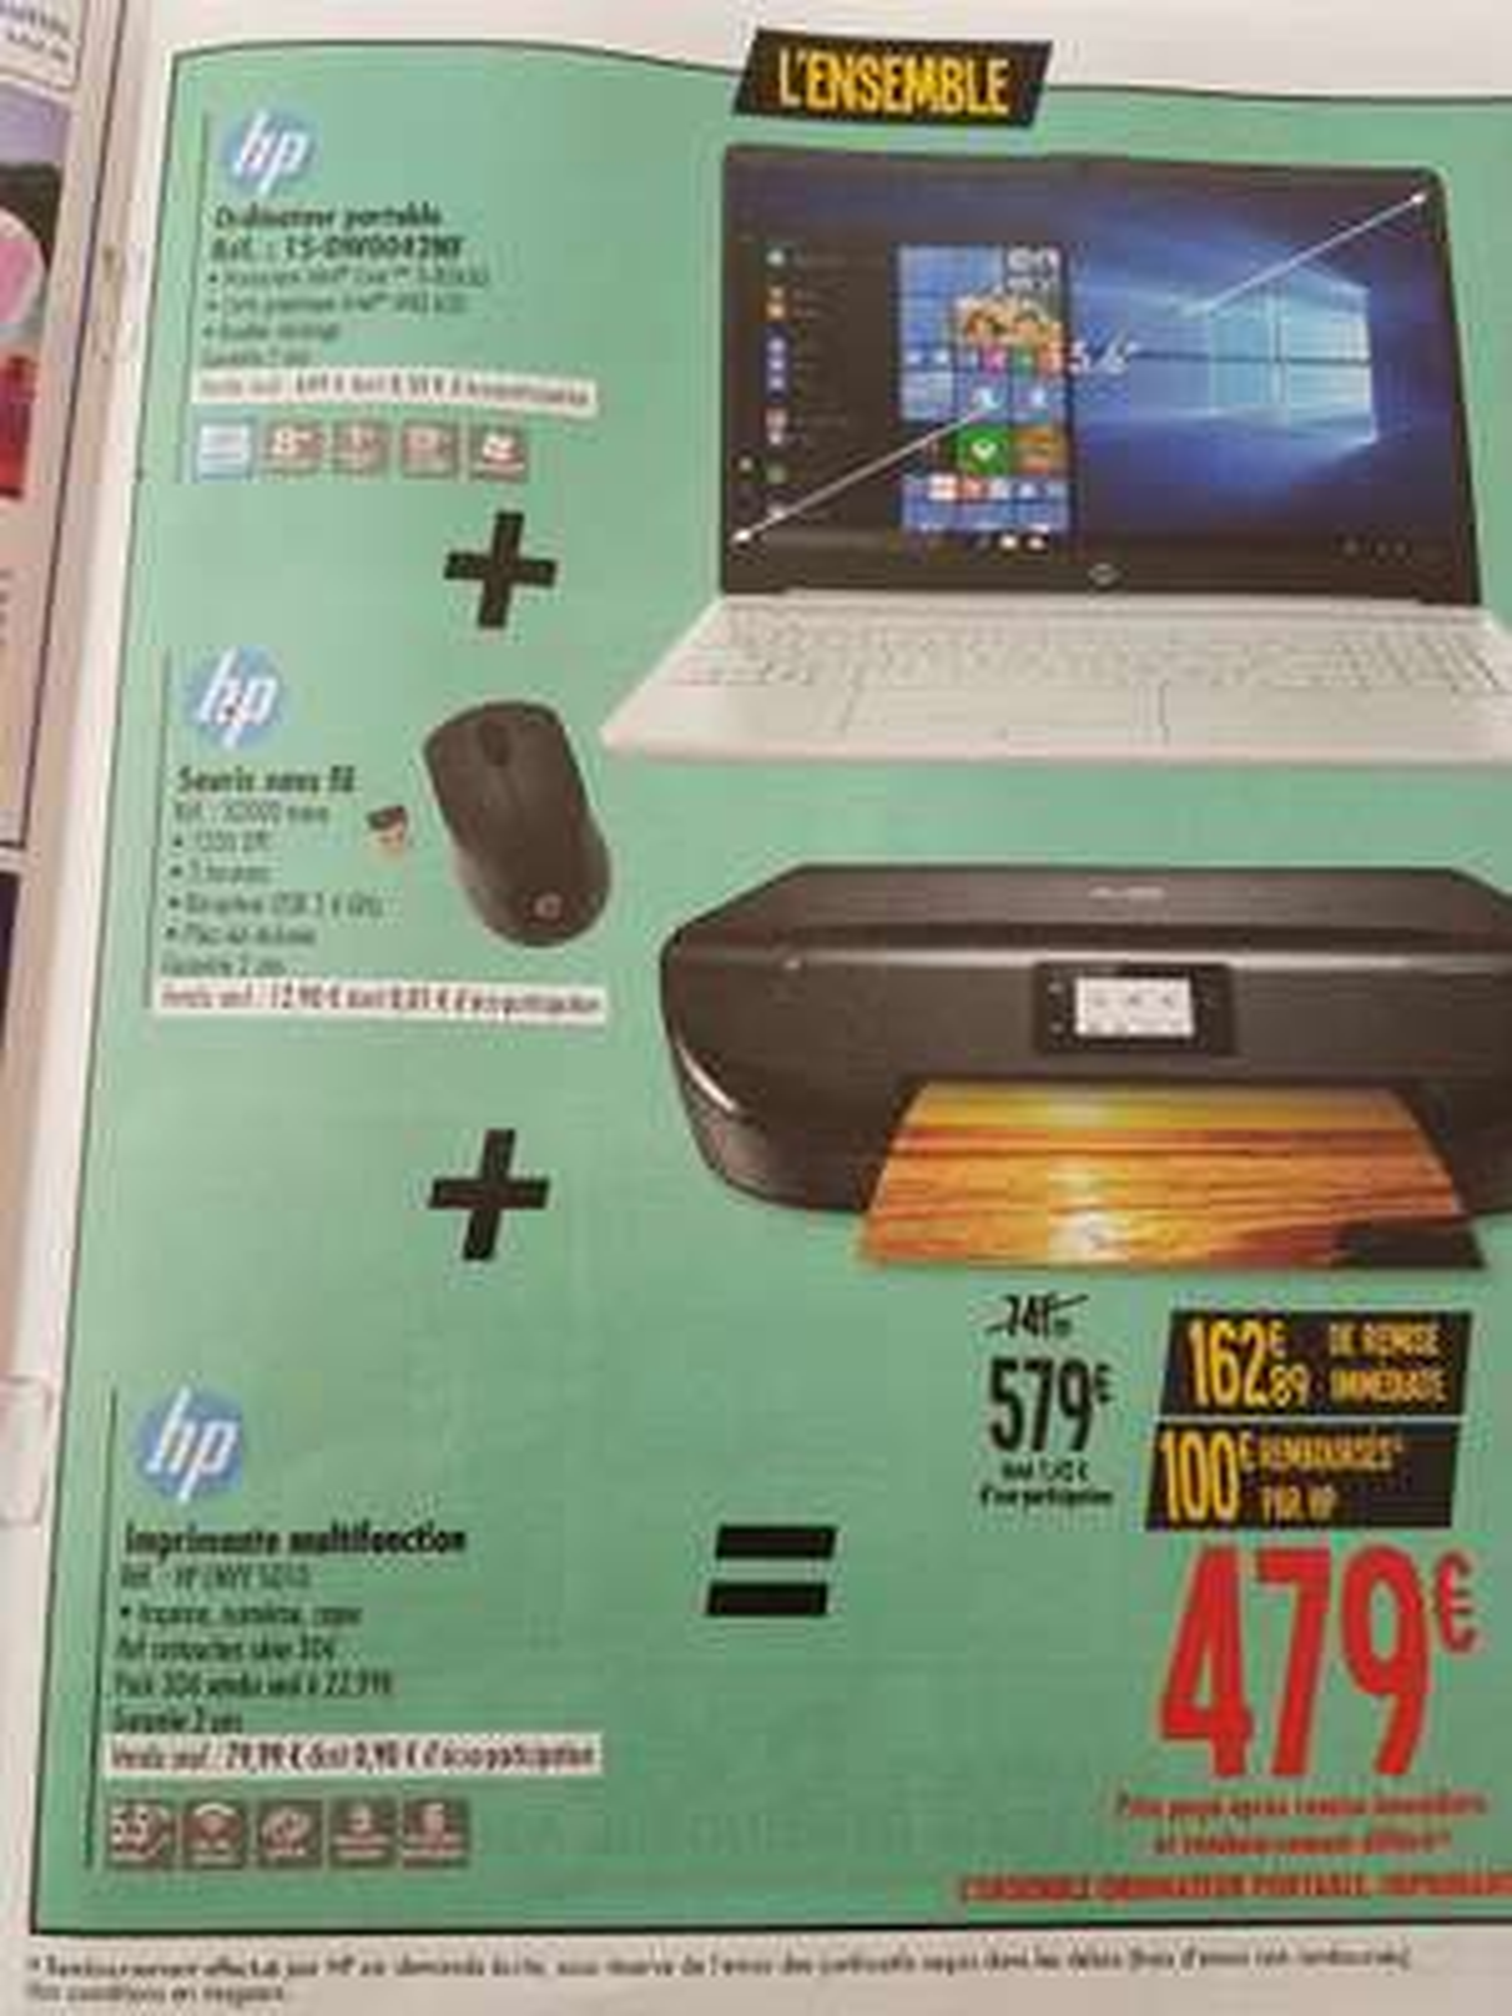 "PC portable 15.6"" HP 15-dw0042nf (i5-8265U, 8Go RAM, 1To + 128Go SSD) + imprimante HP Envy 5010 + souris sans-fil HP X3000 (via ODR de 100€)"